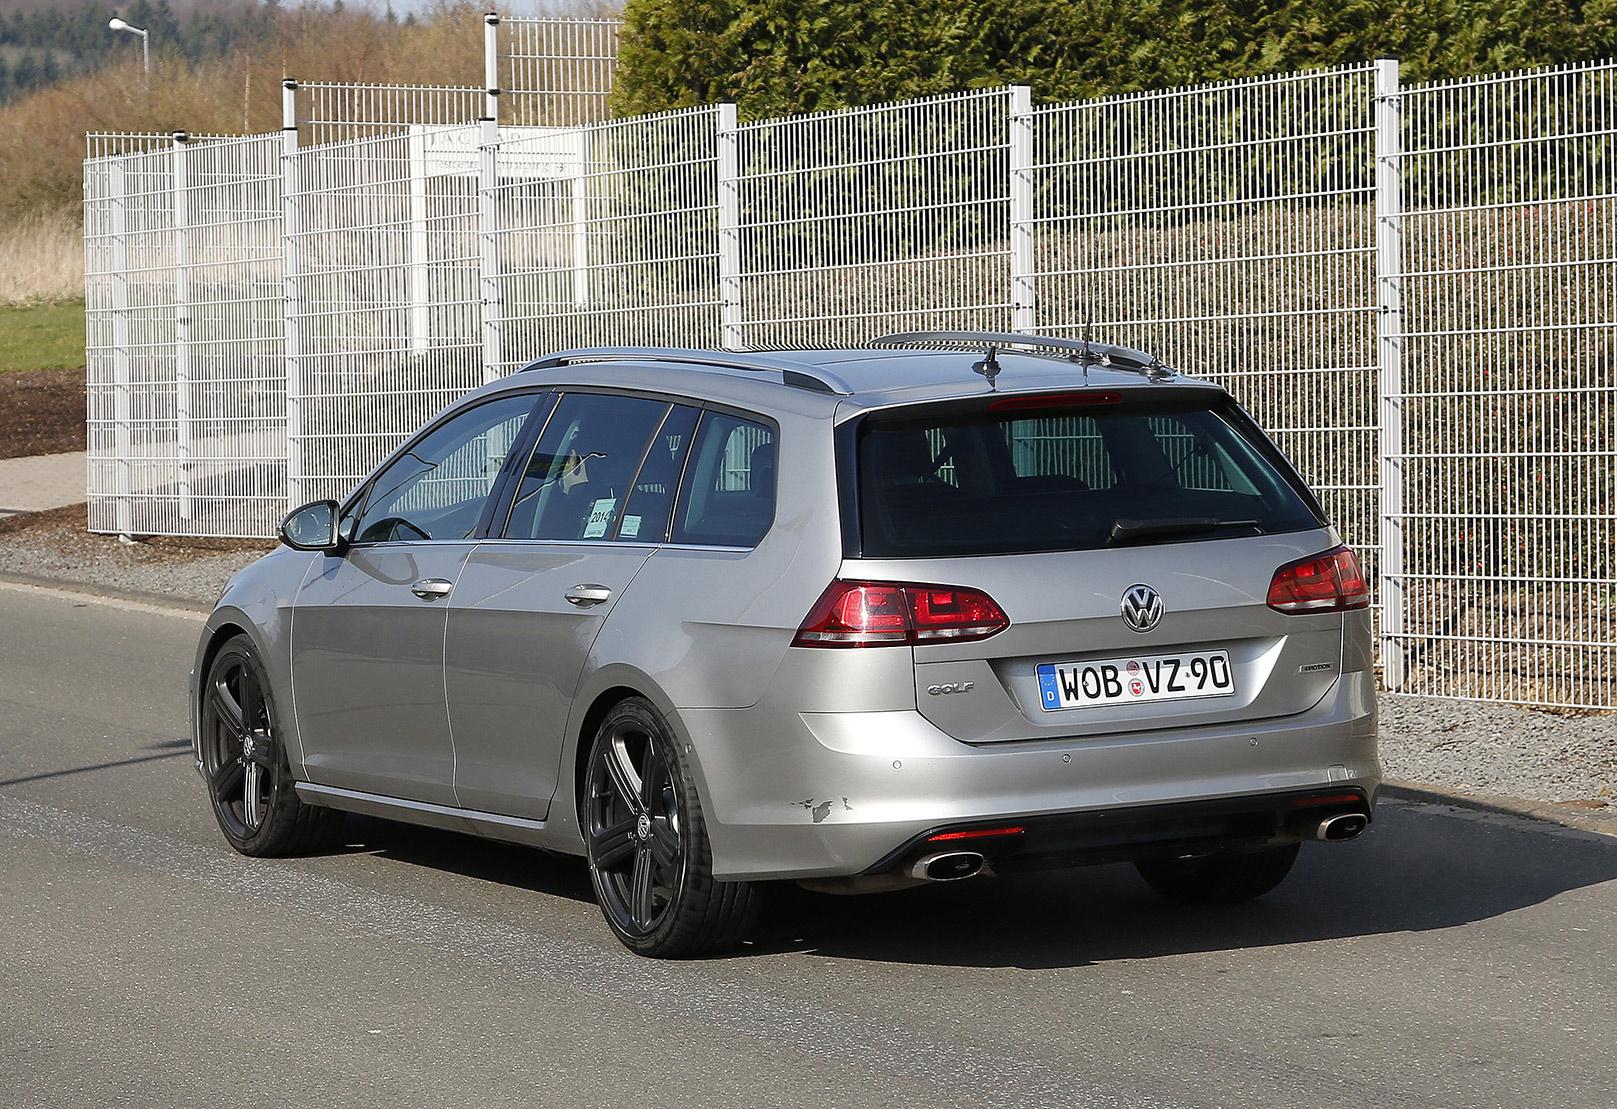 volkswagen-golf-r-variant-wagon-007